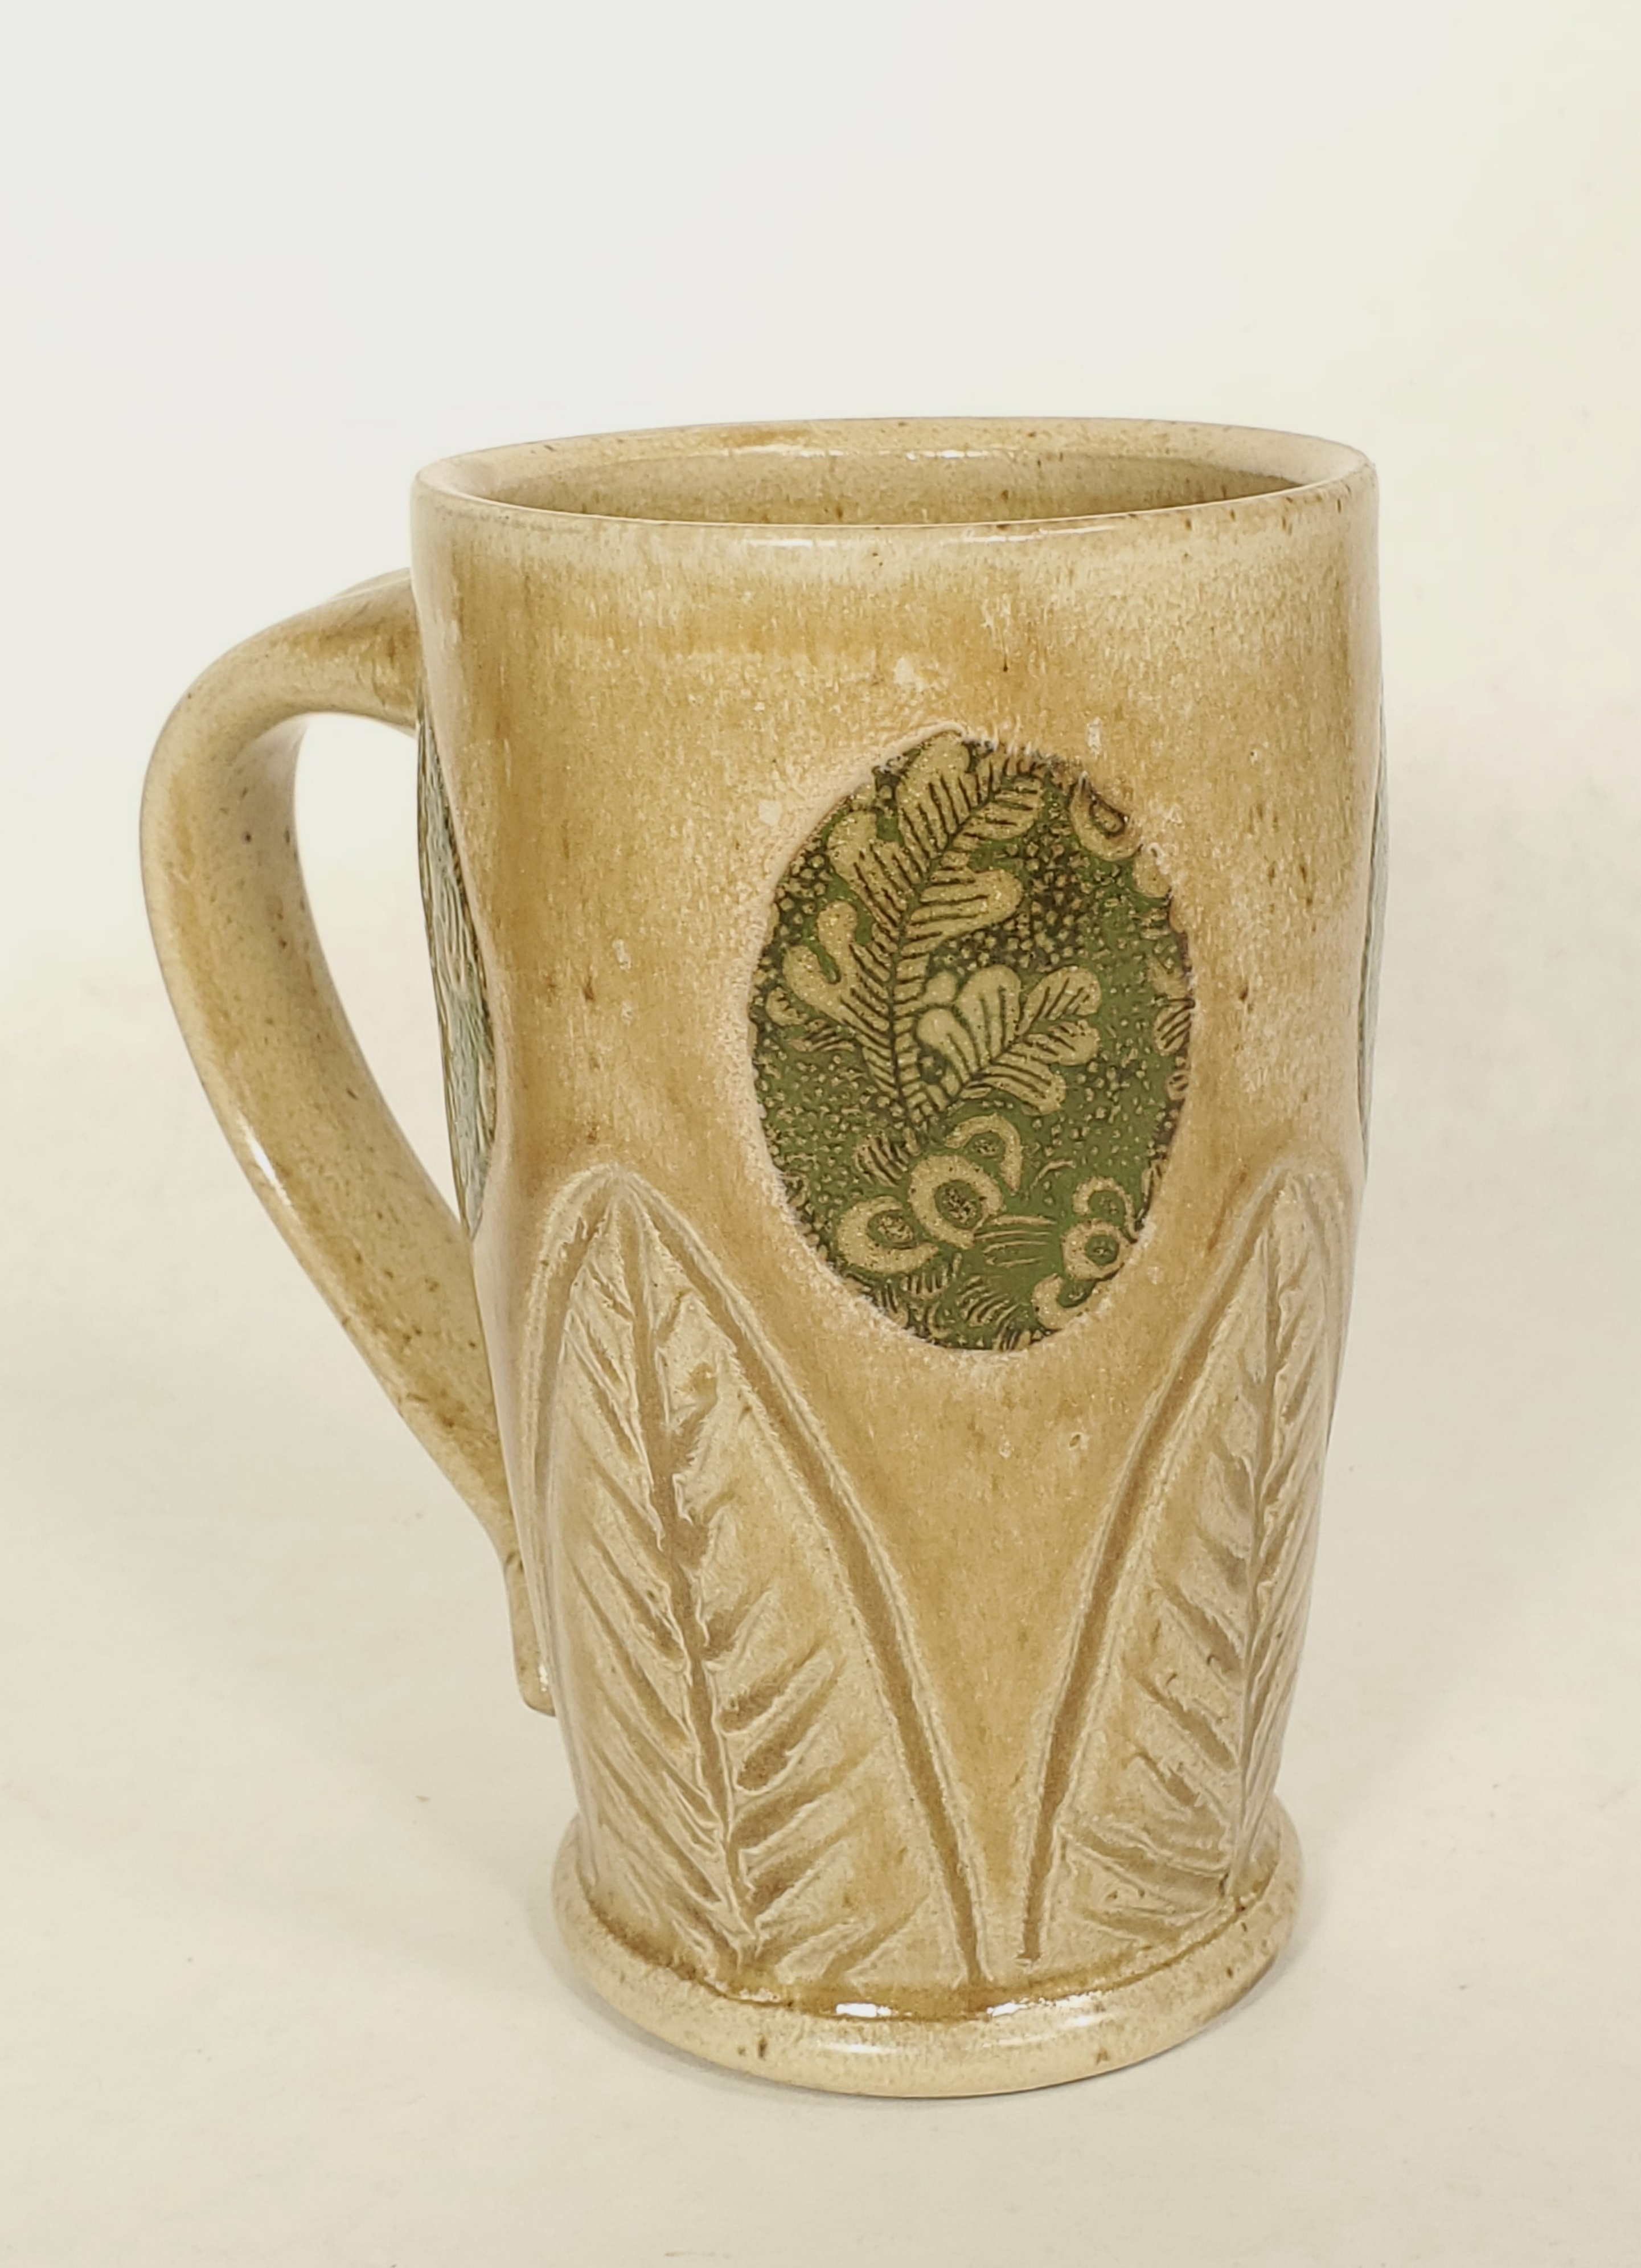 Tall tan Mug